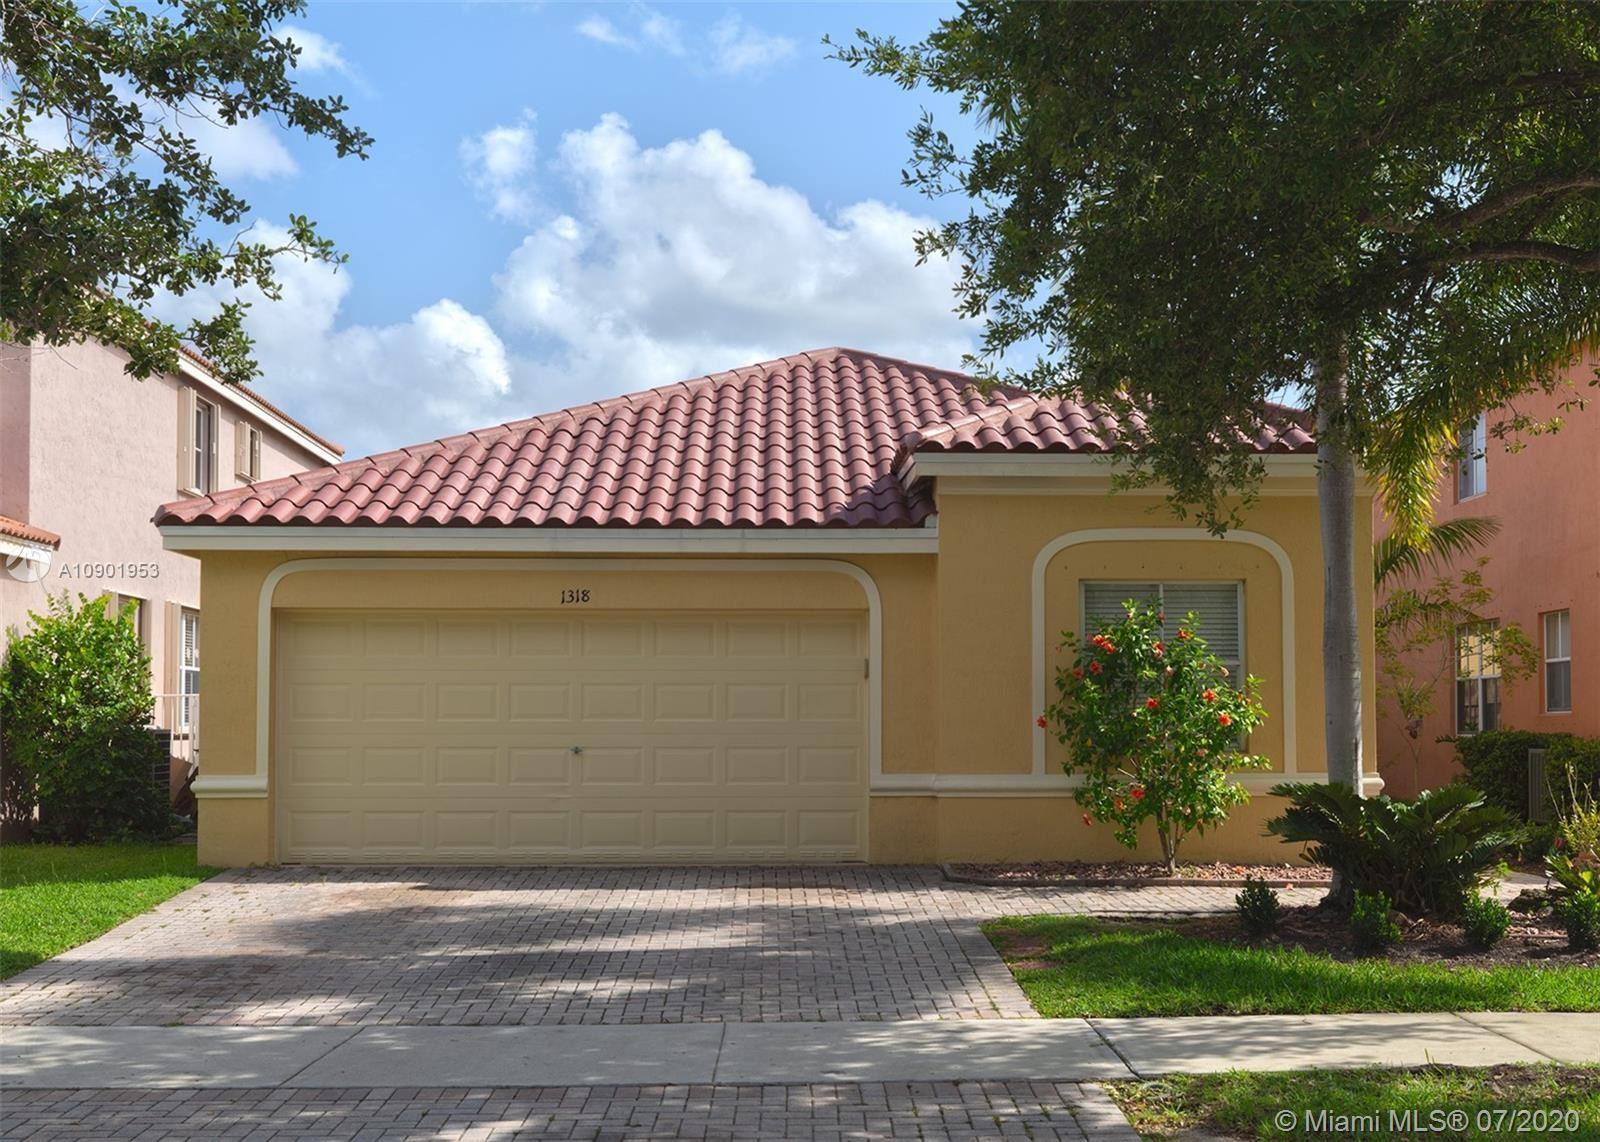 1318 Banyan Way, Weston, FL 33327 - #: A10901953